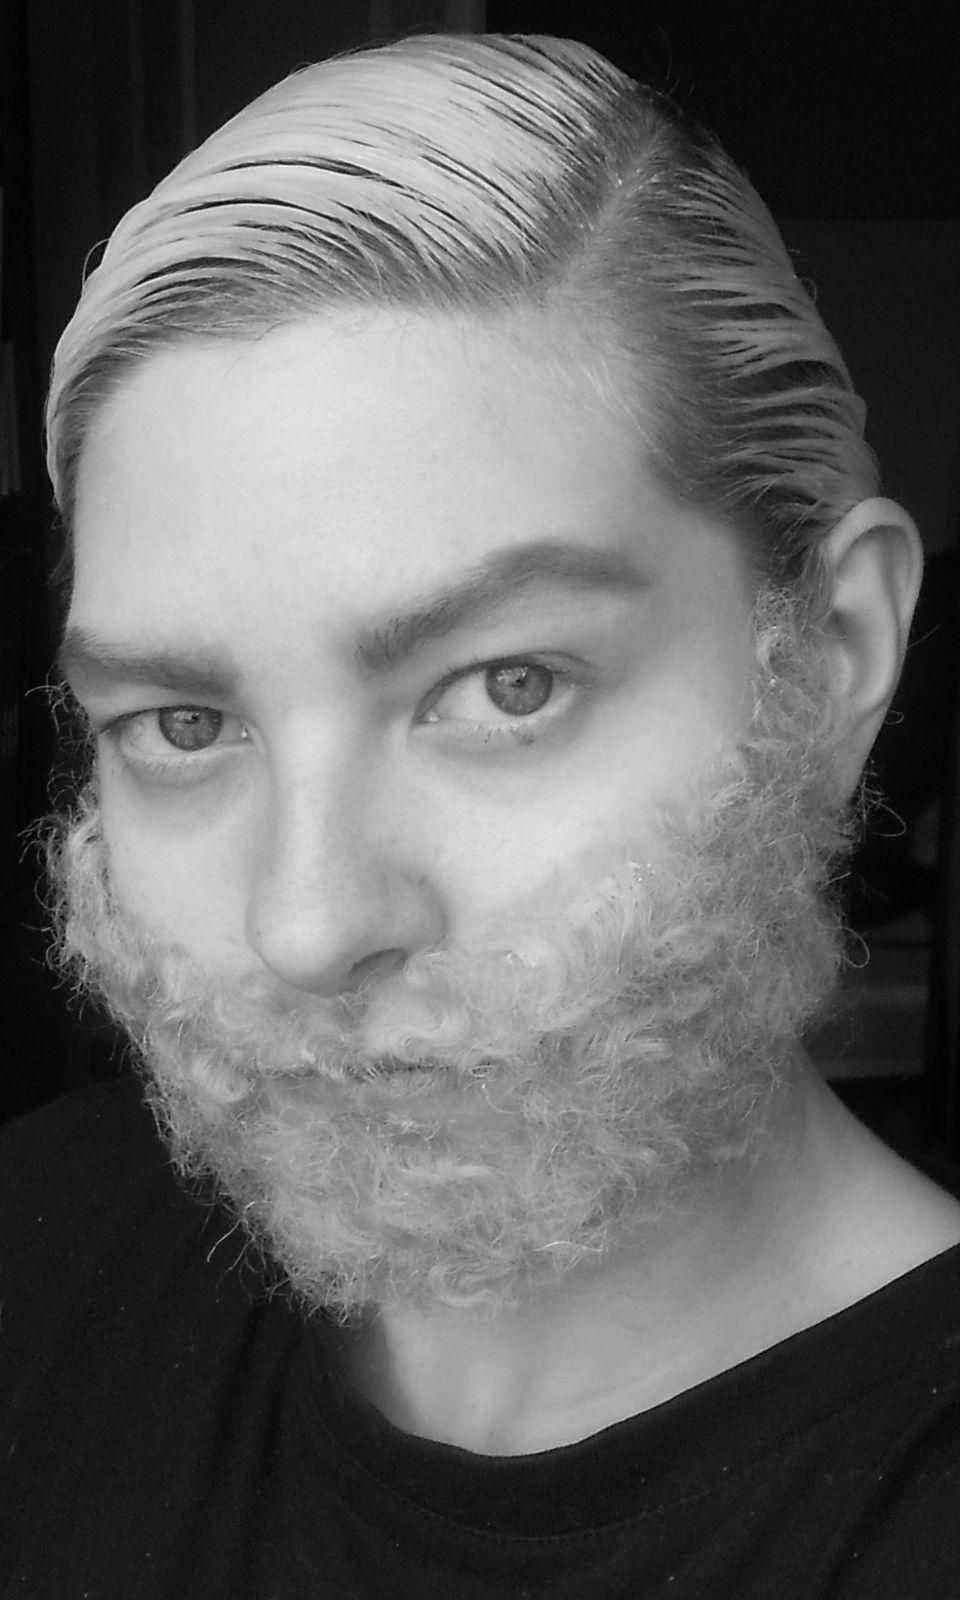 SMUF : Si j'étais un homme !!